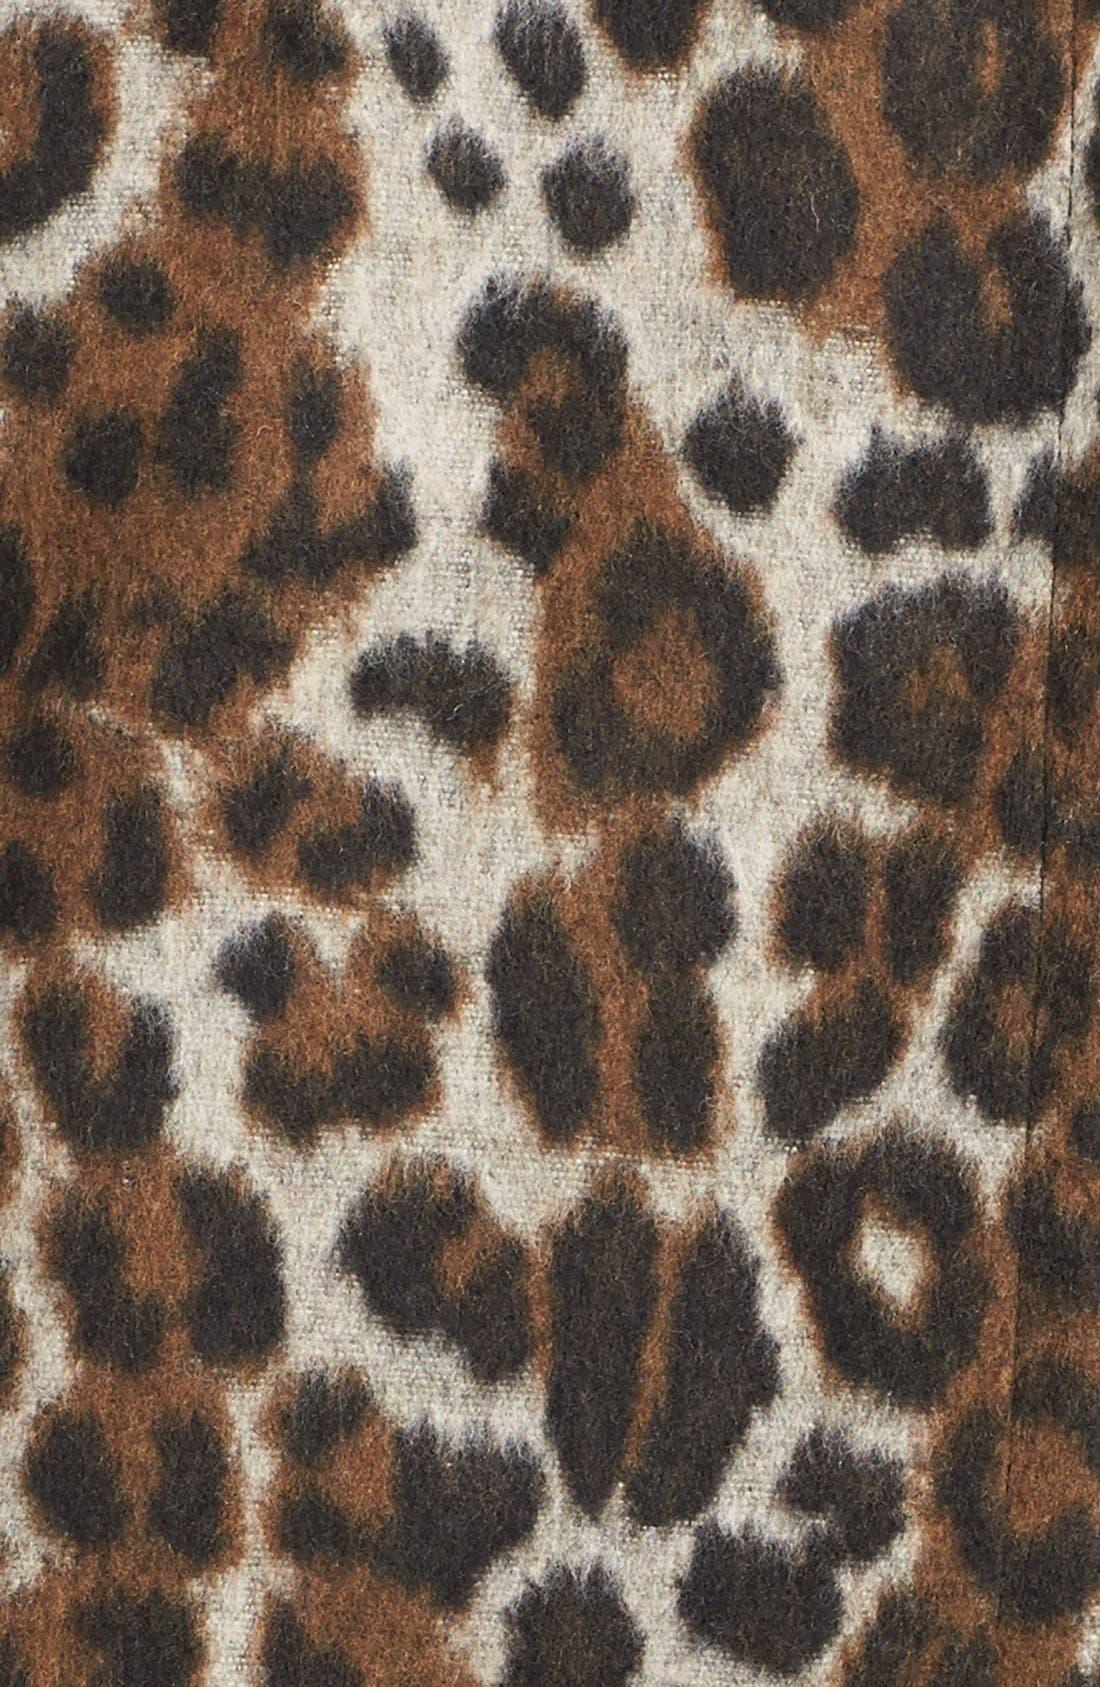 Leopard Print Car Coat,                             Alternate thumbnail 3, color,                             Leopard